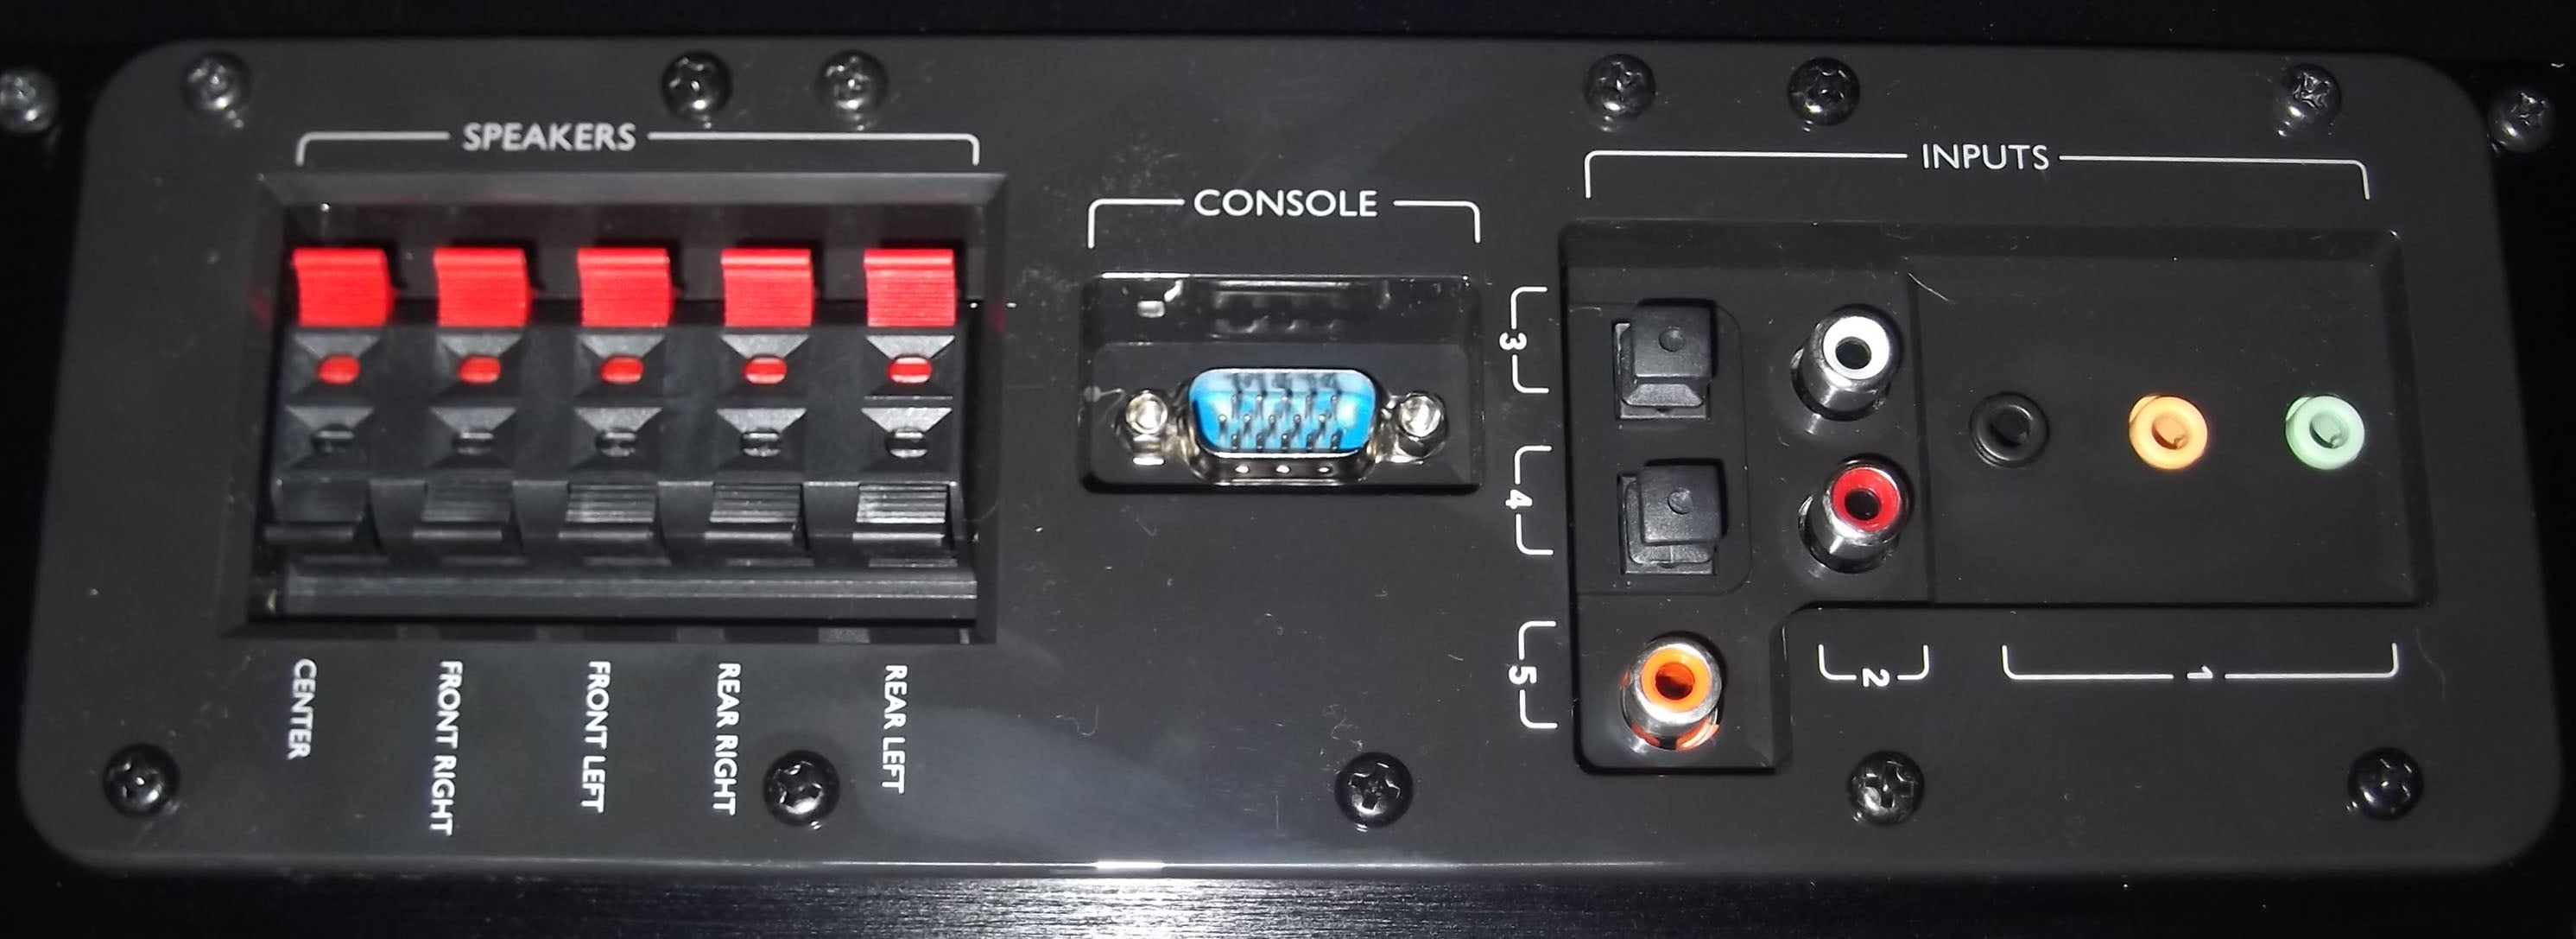 Logitech Z906 IO panel